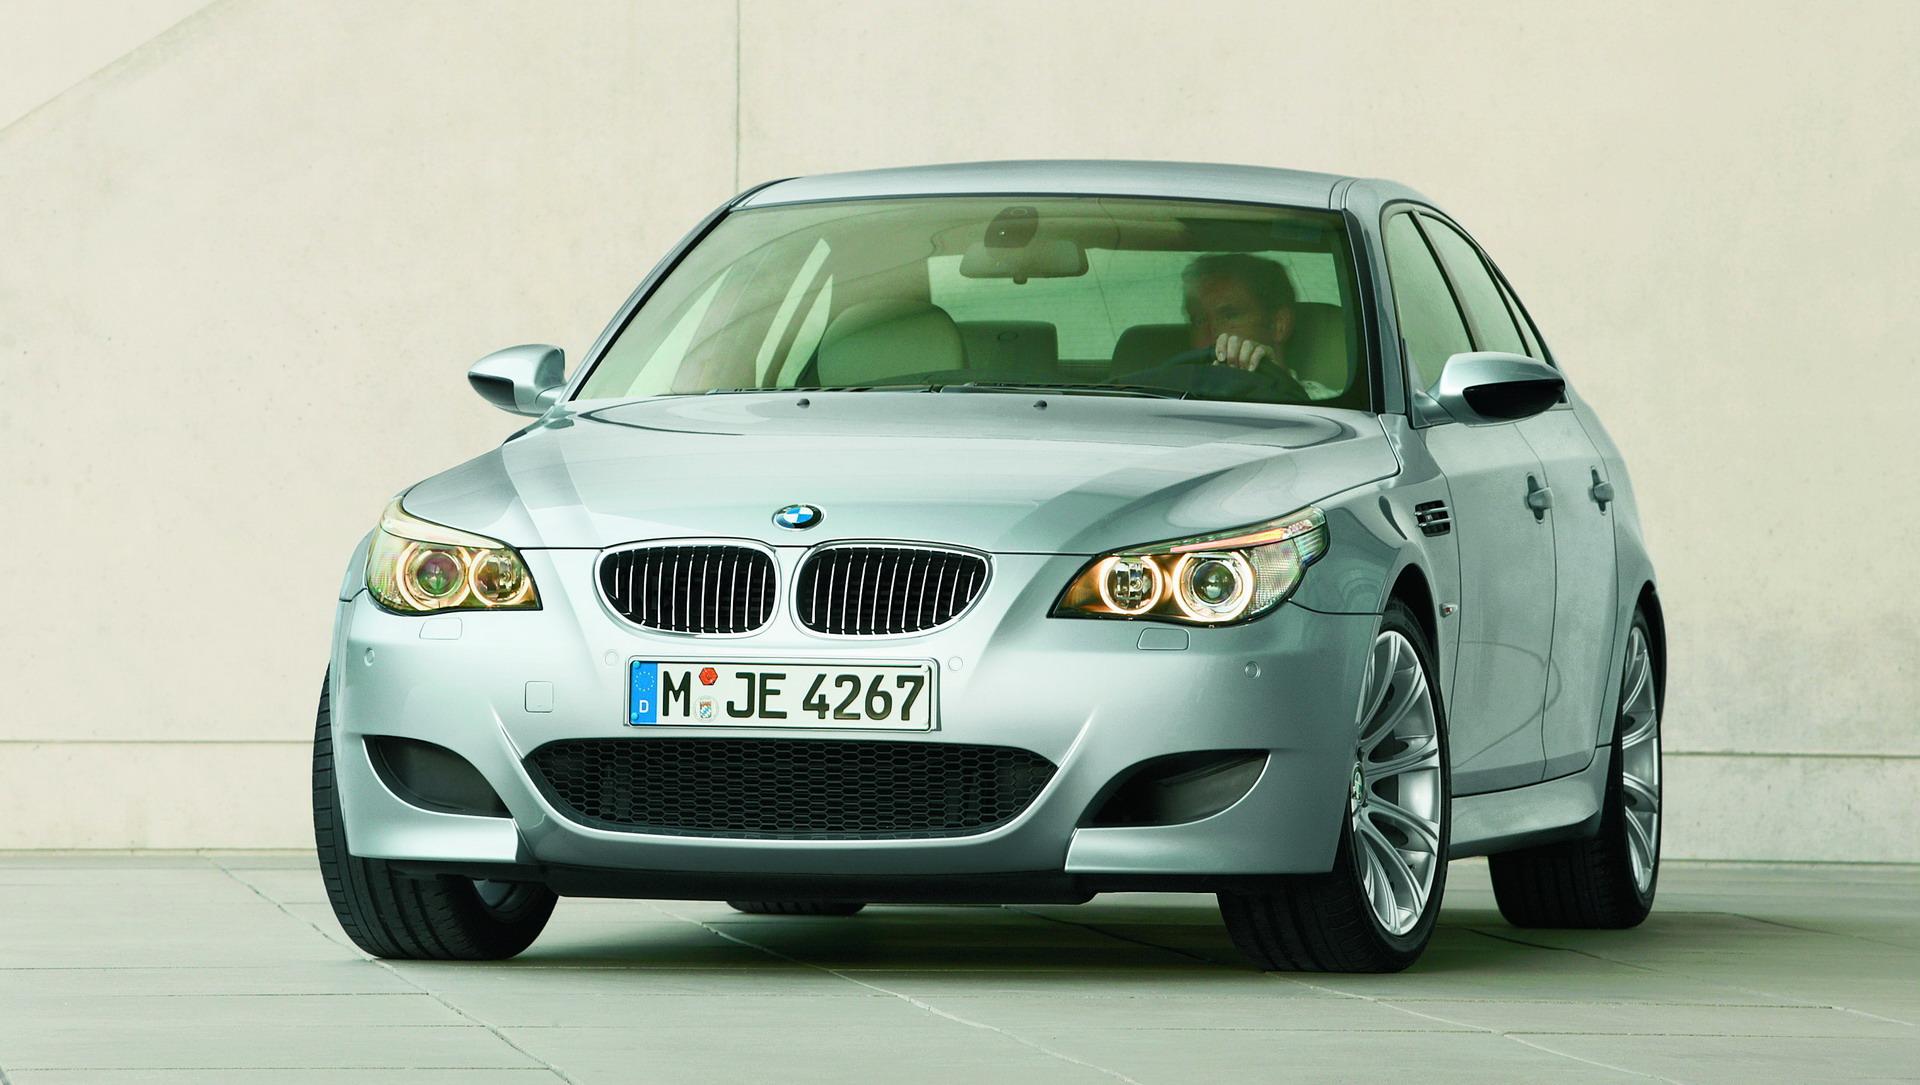 BMW M5 E60M 2005